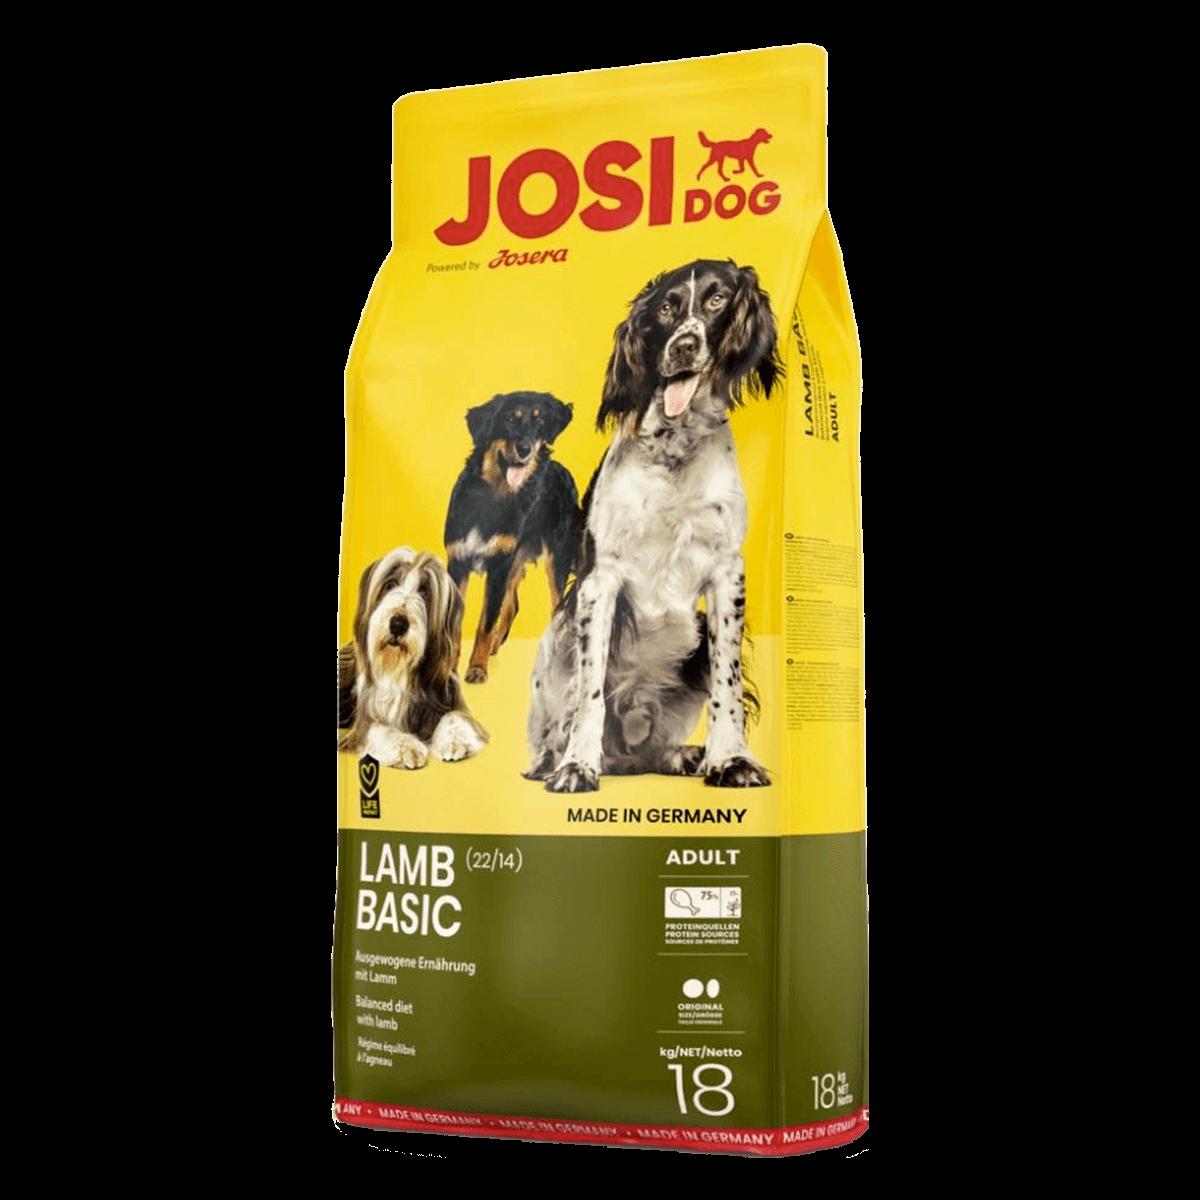 Josera JosiDog Lamb Basic 22/14, 18 кг - корм Йозера для ...